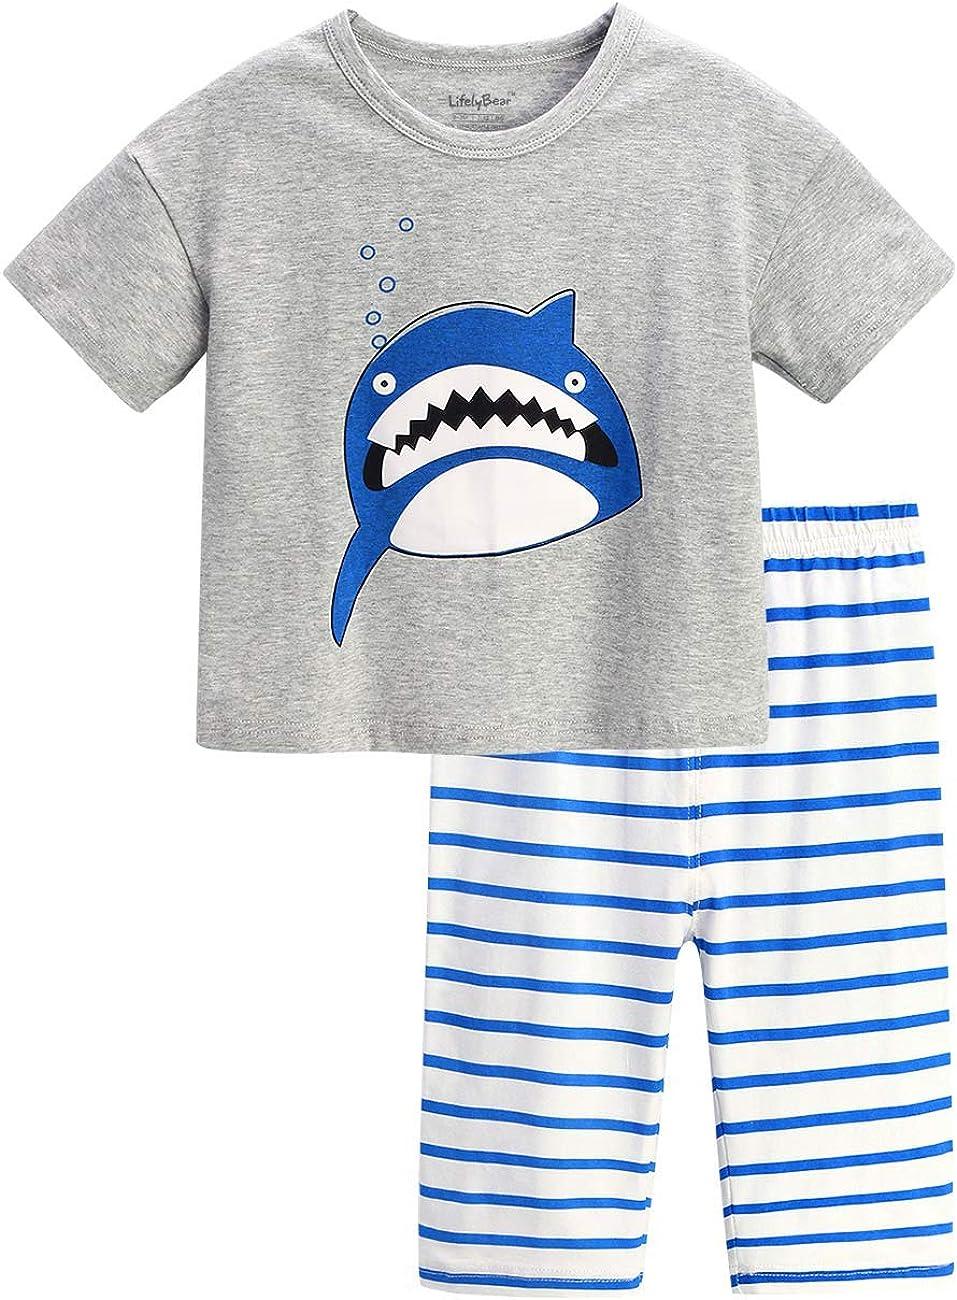 Kids Pajamas Children Pajamas for Boys Girls Unisex Cotton Pjs Summer Sleepwear Set Size 2T 3T 4 5 7 8